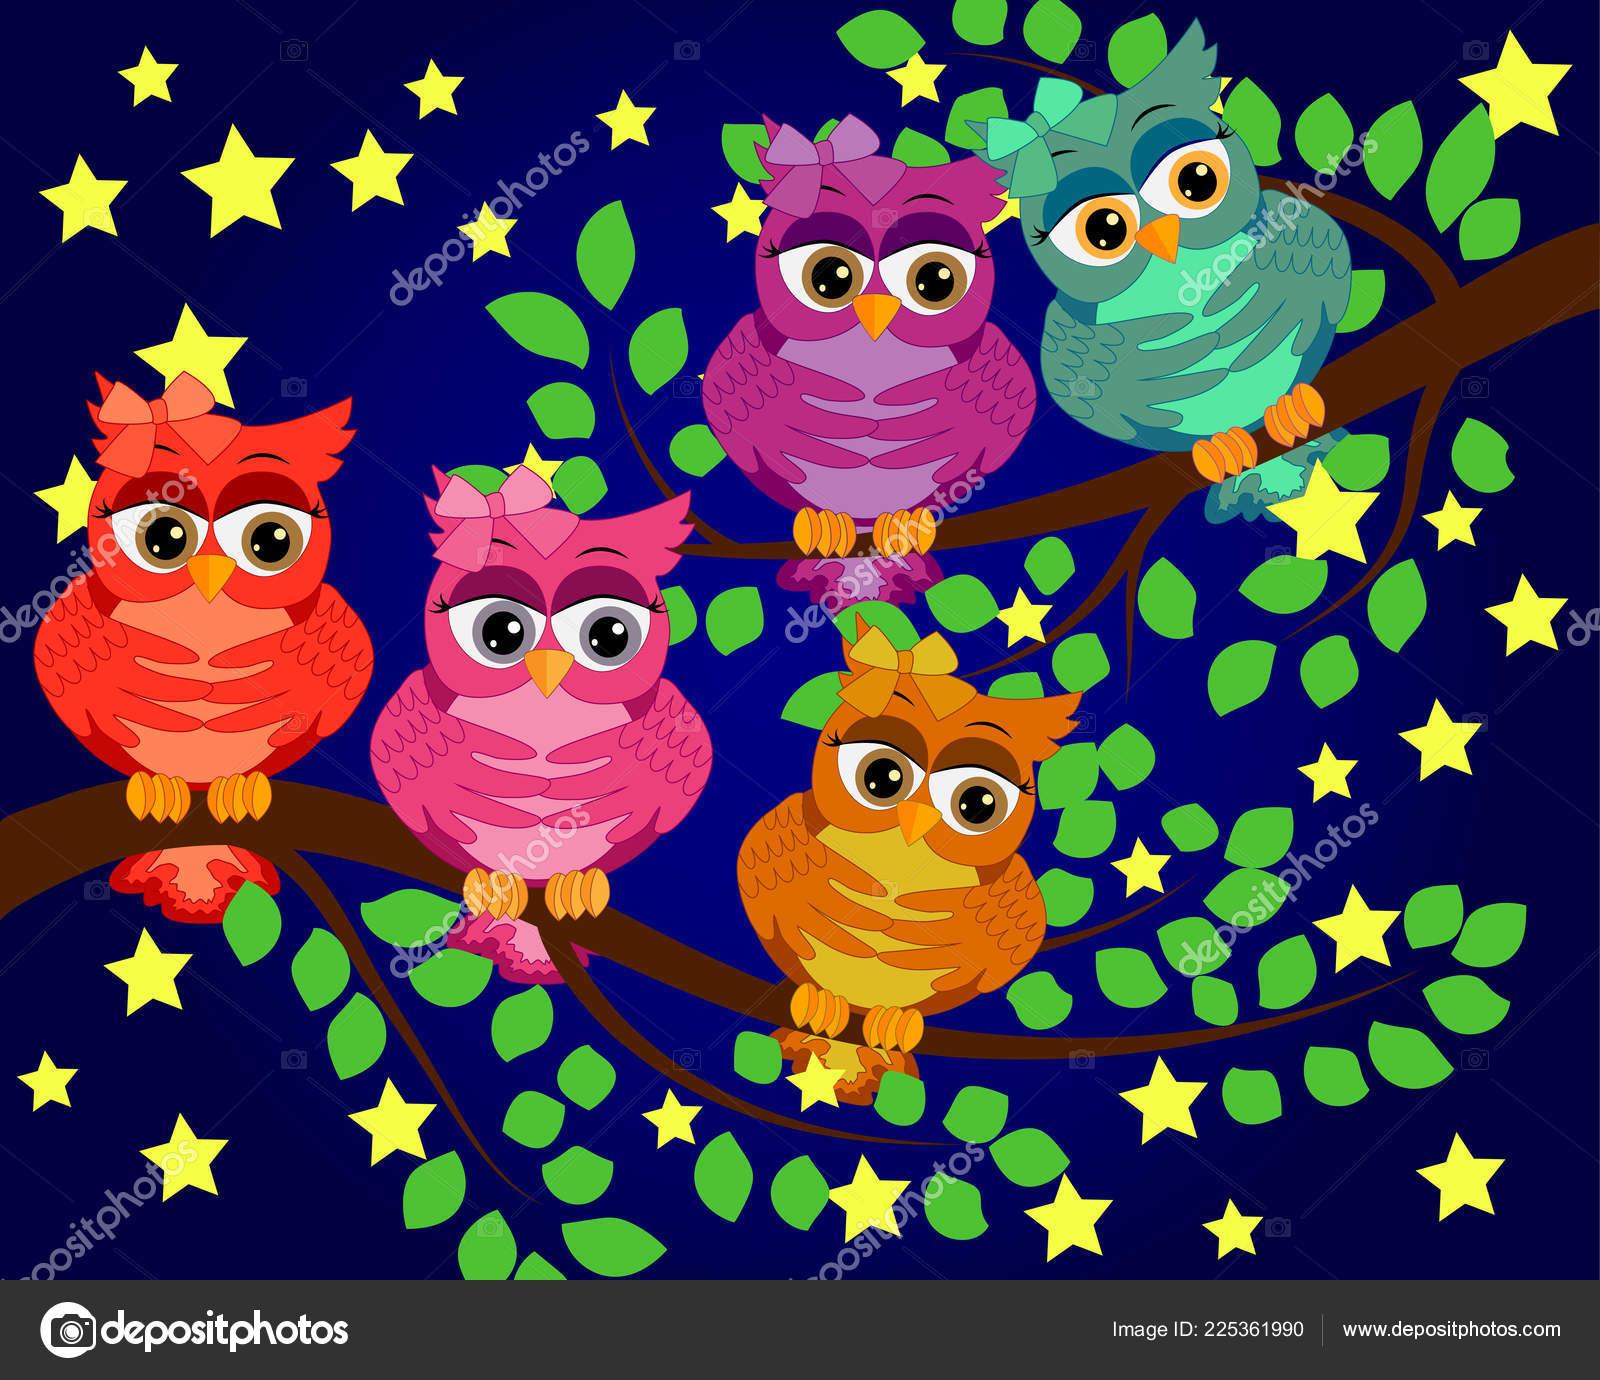 Good Night Sweet Dreams Night Scene Moon Stars Owl Owl Stock